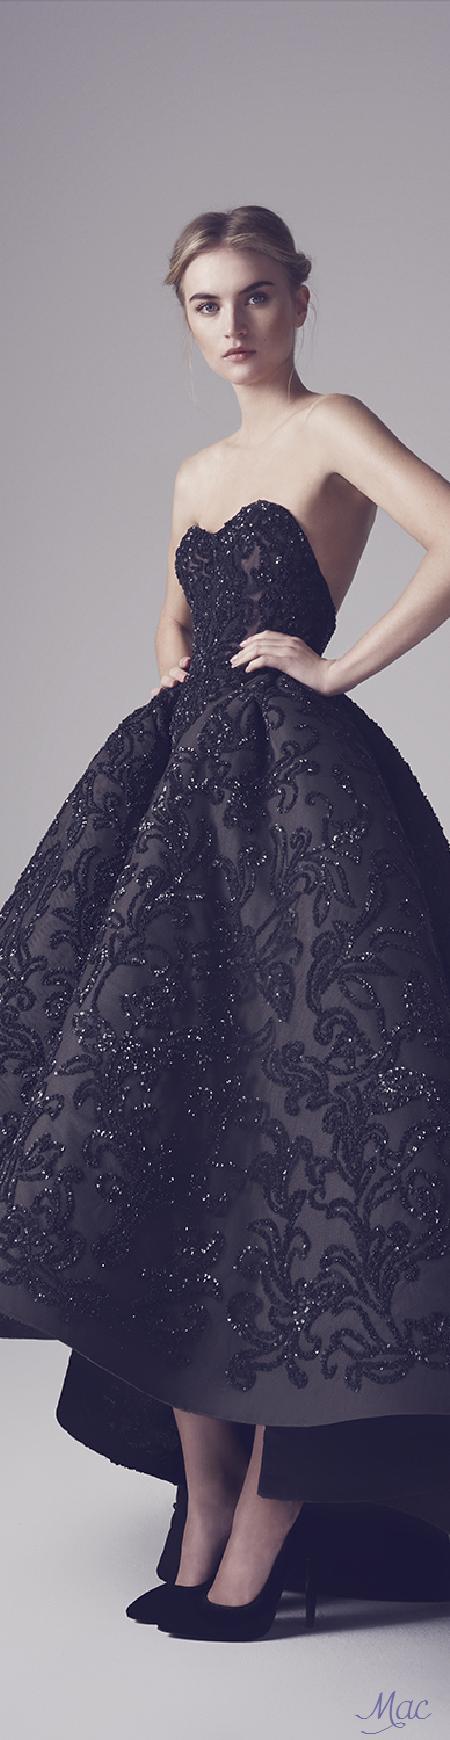 Spring 2016 Haute Couture Ashi Studio | Conny.Rojo | Pinterest ...